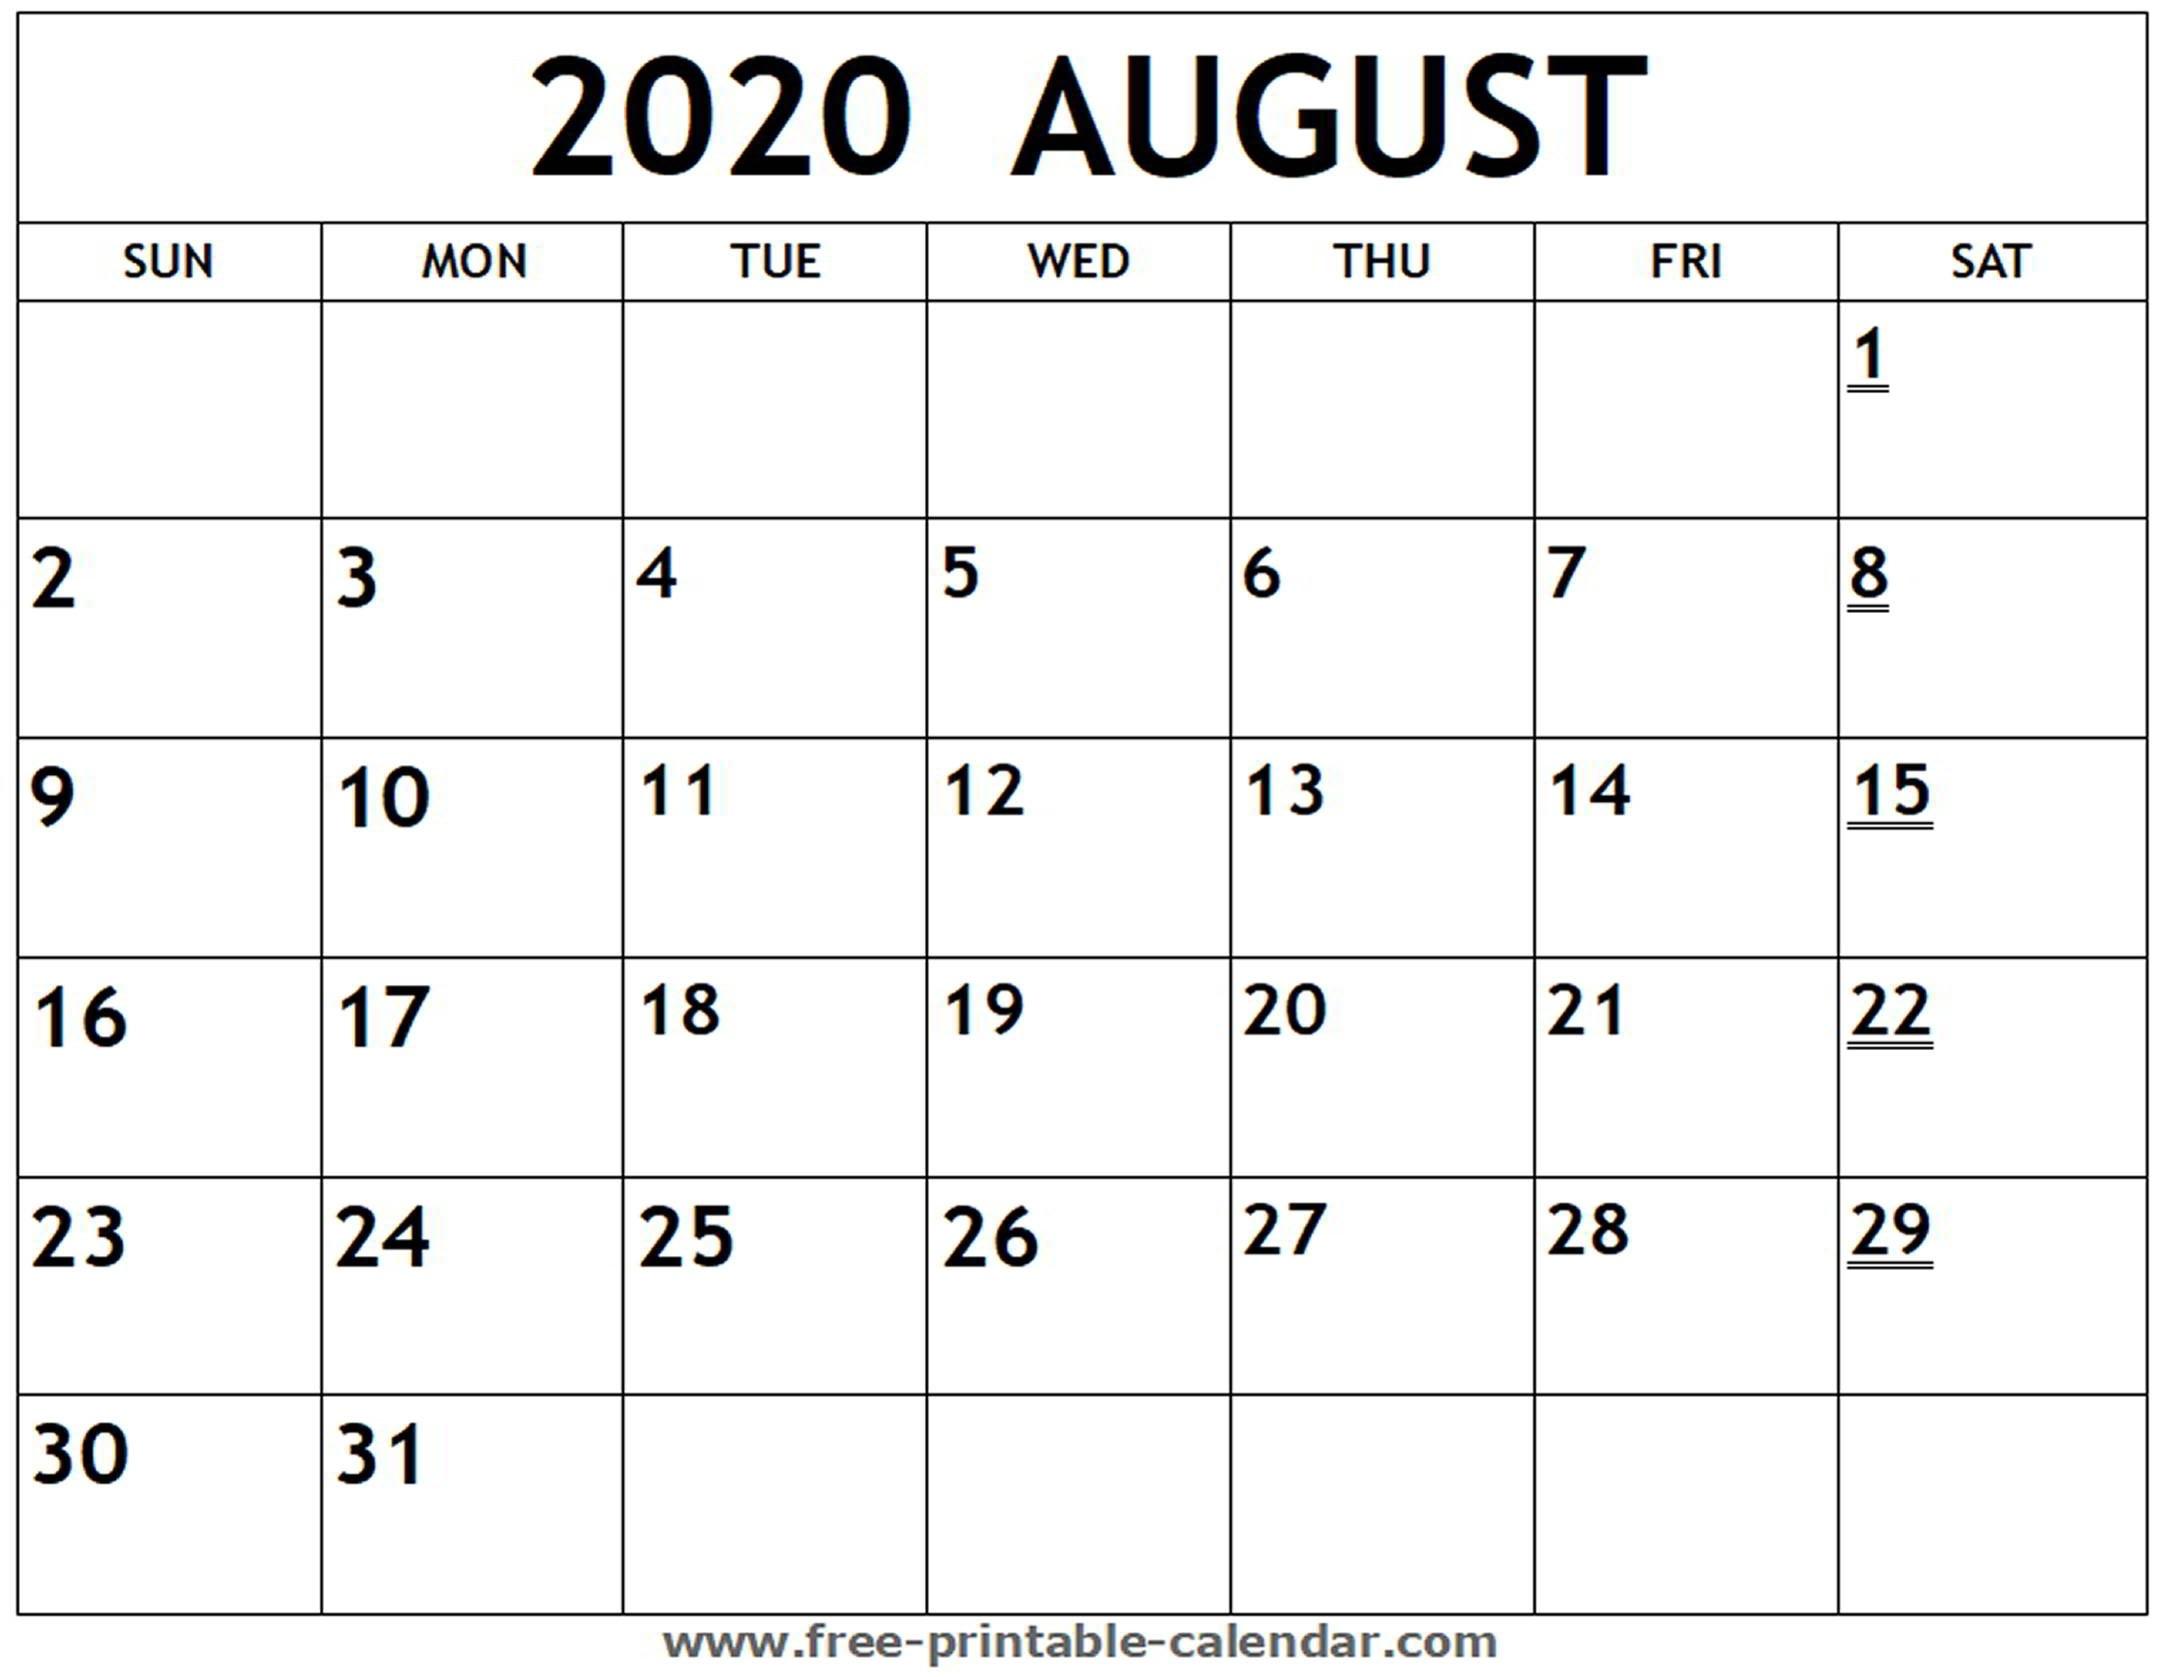 Printable 2020 August Calendar - Free-Printable-Calendar-Blank Printable Calendar July And August 2020